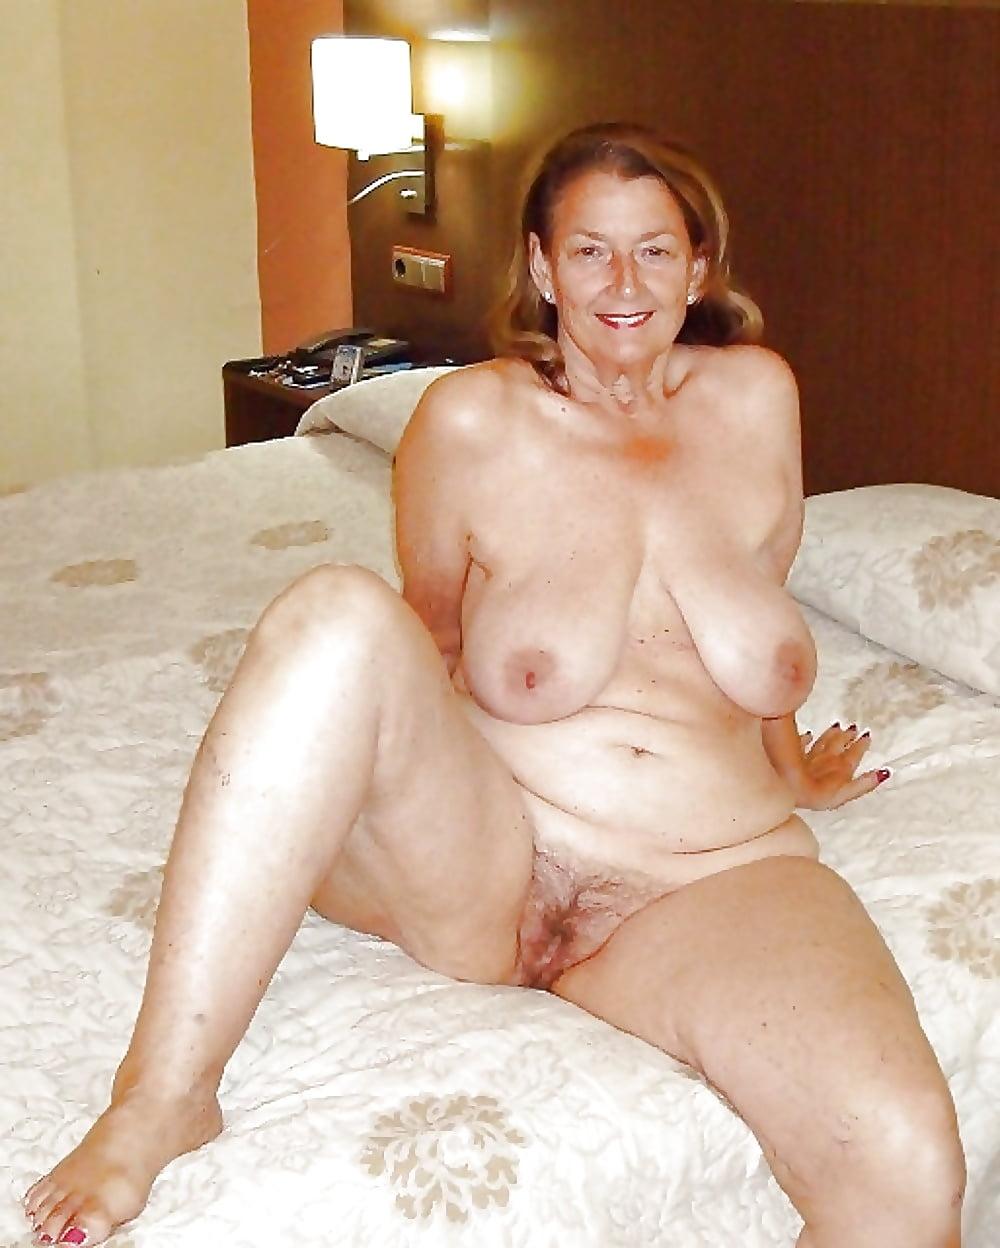 Granny amateur naked